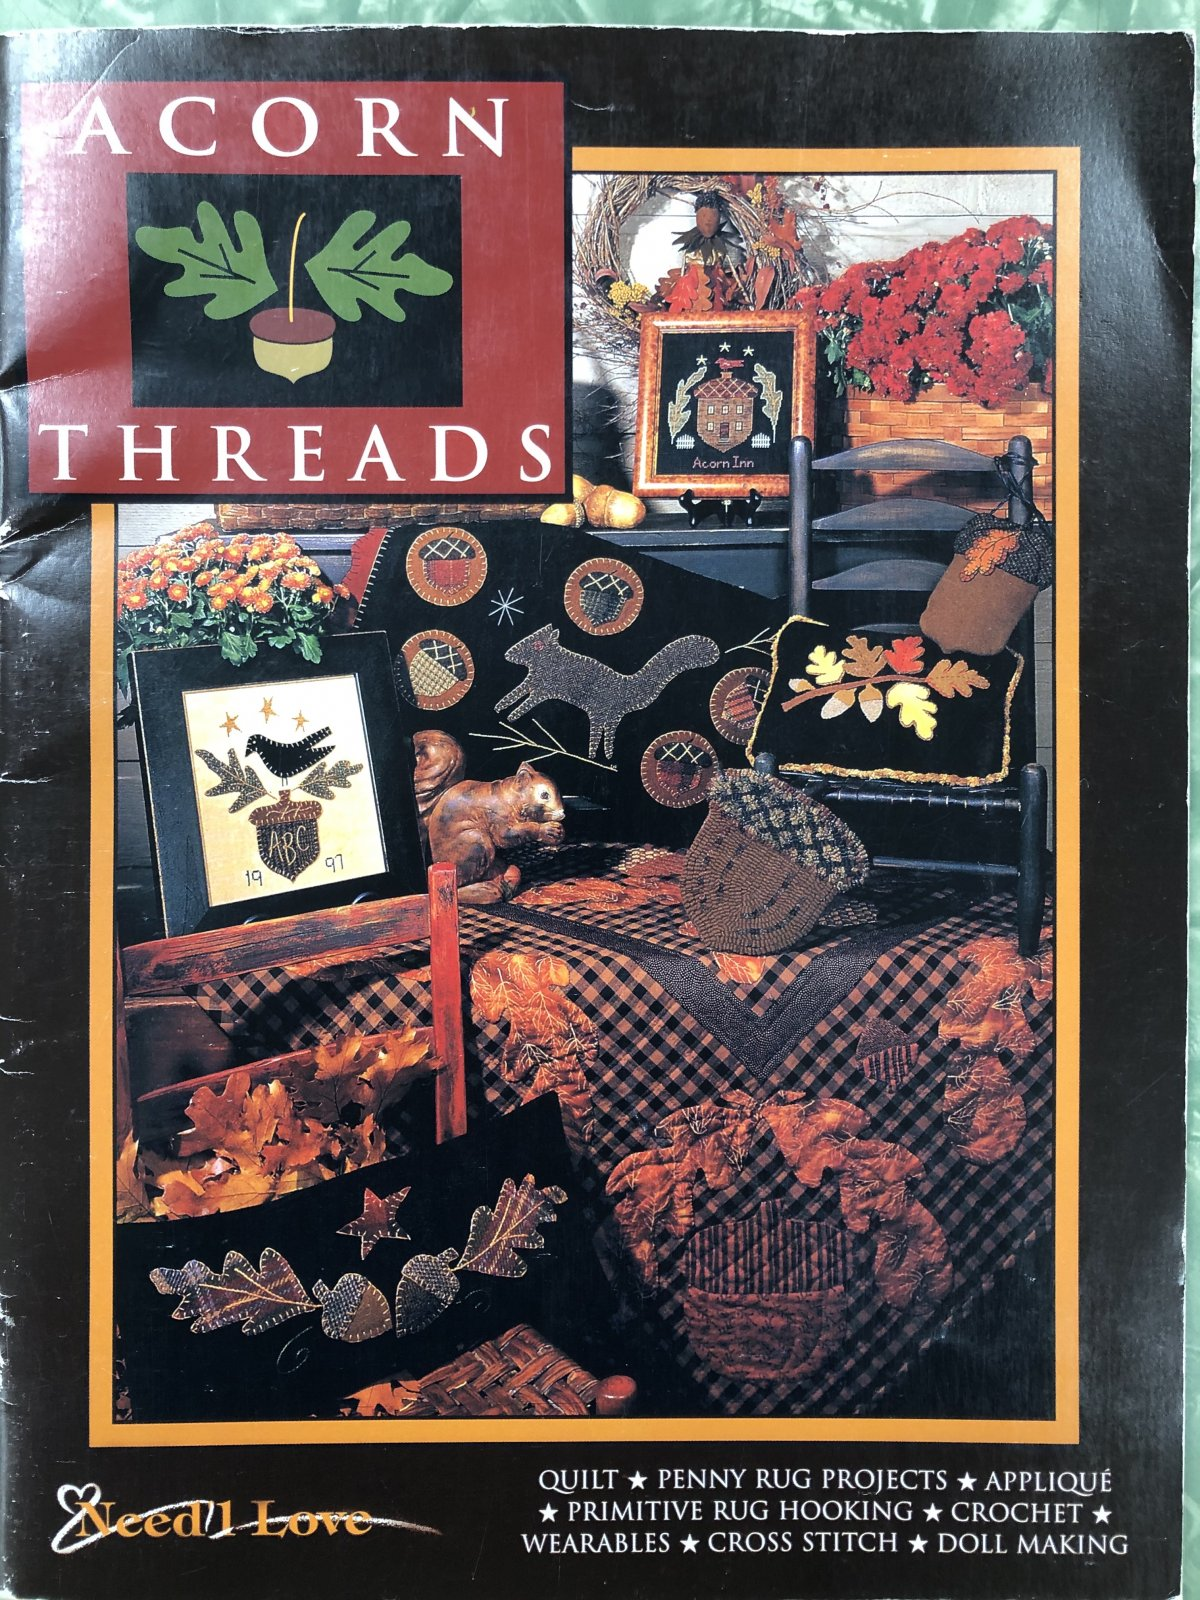 Acorn Threads